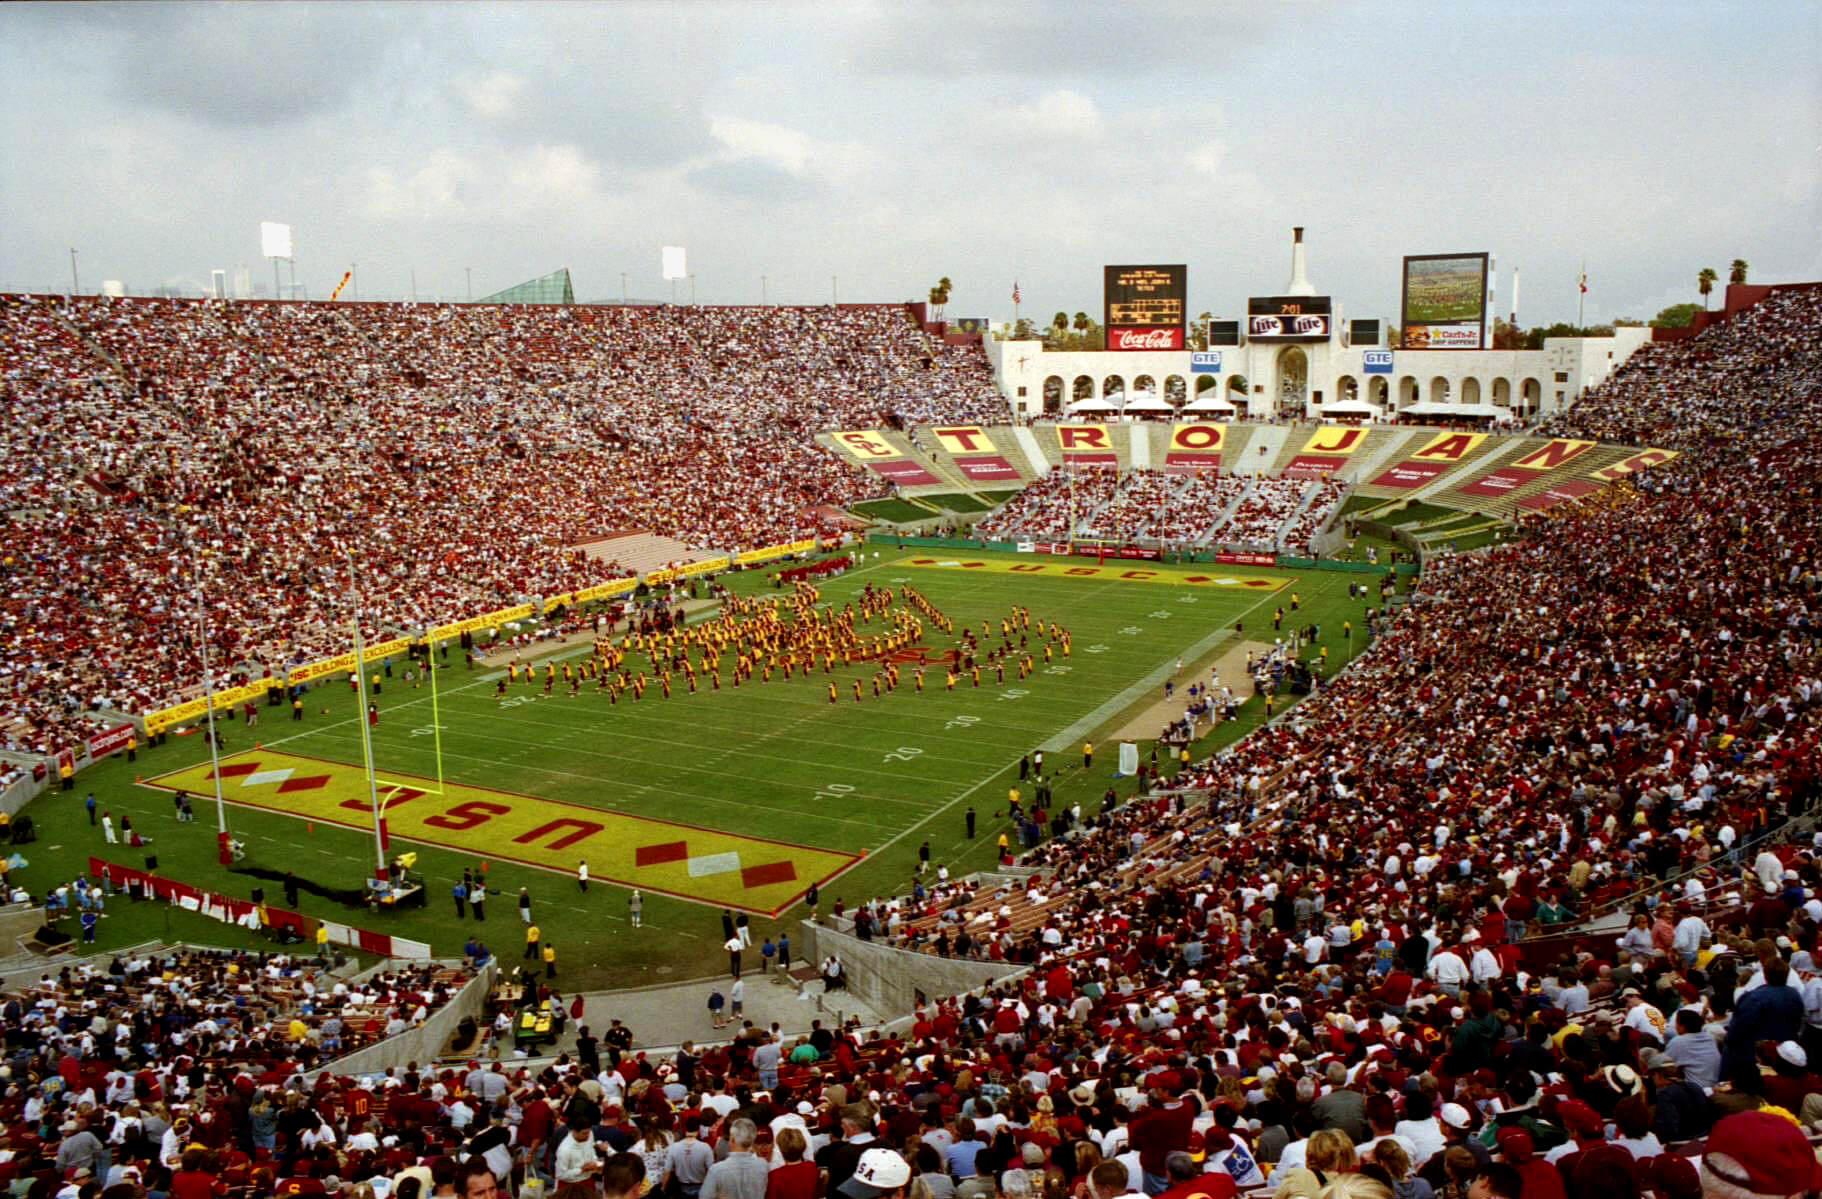 Los Angeles Memorial Coliseum football game